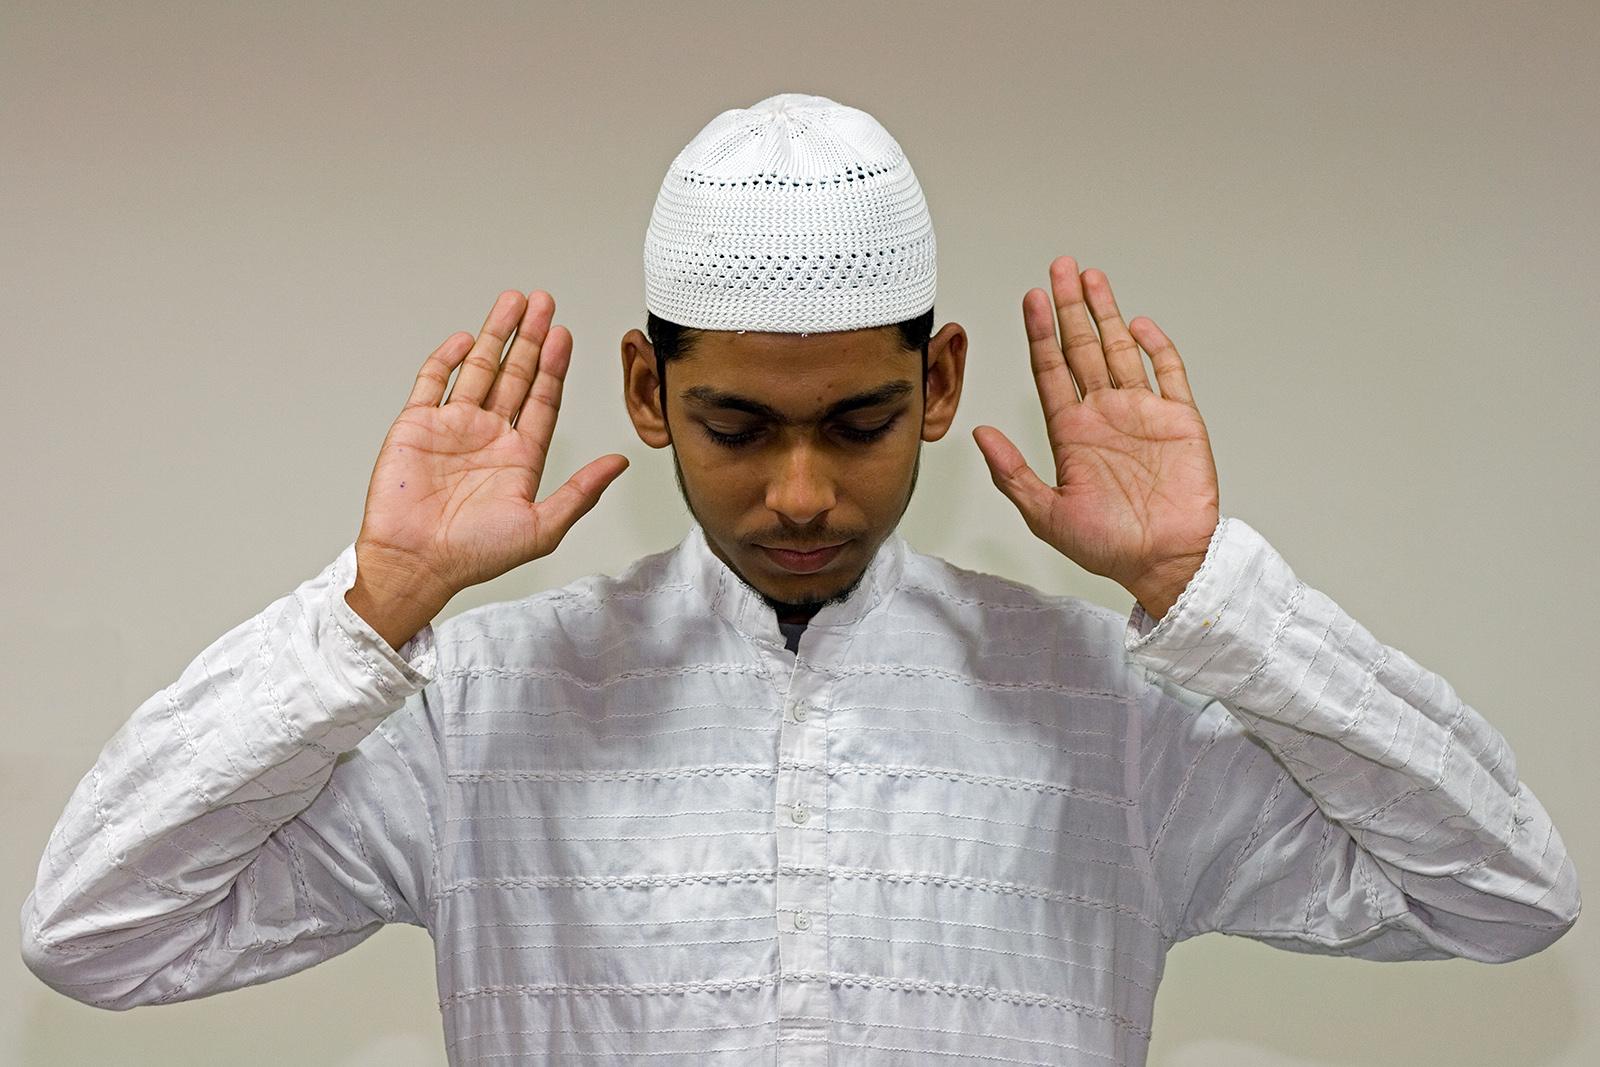 A Muslim man engaged in Muslim prayer